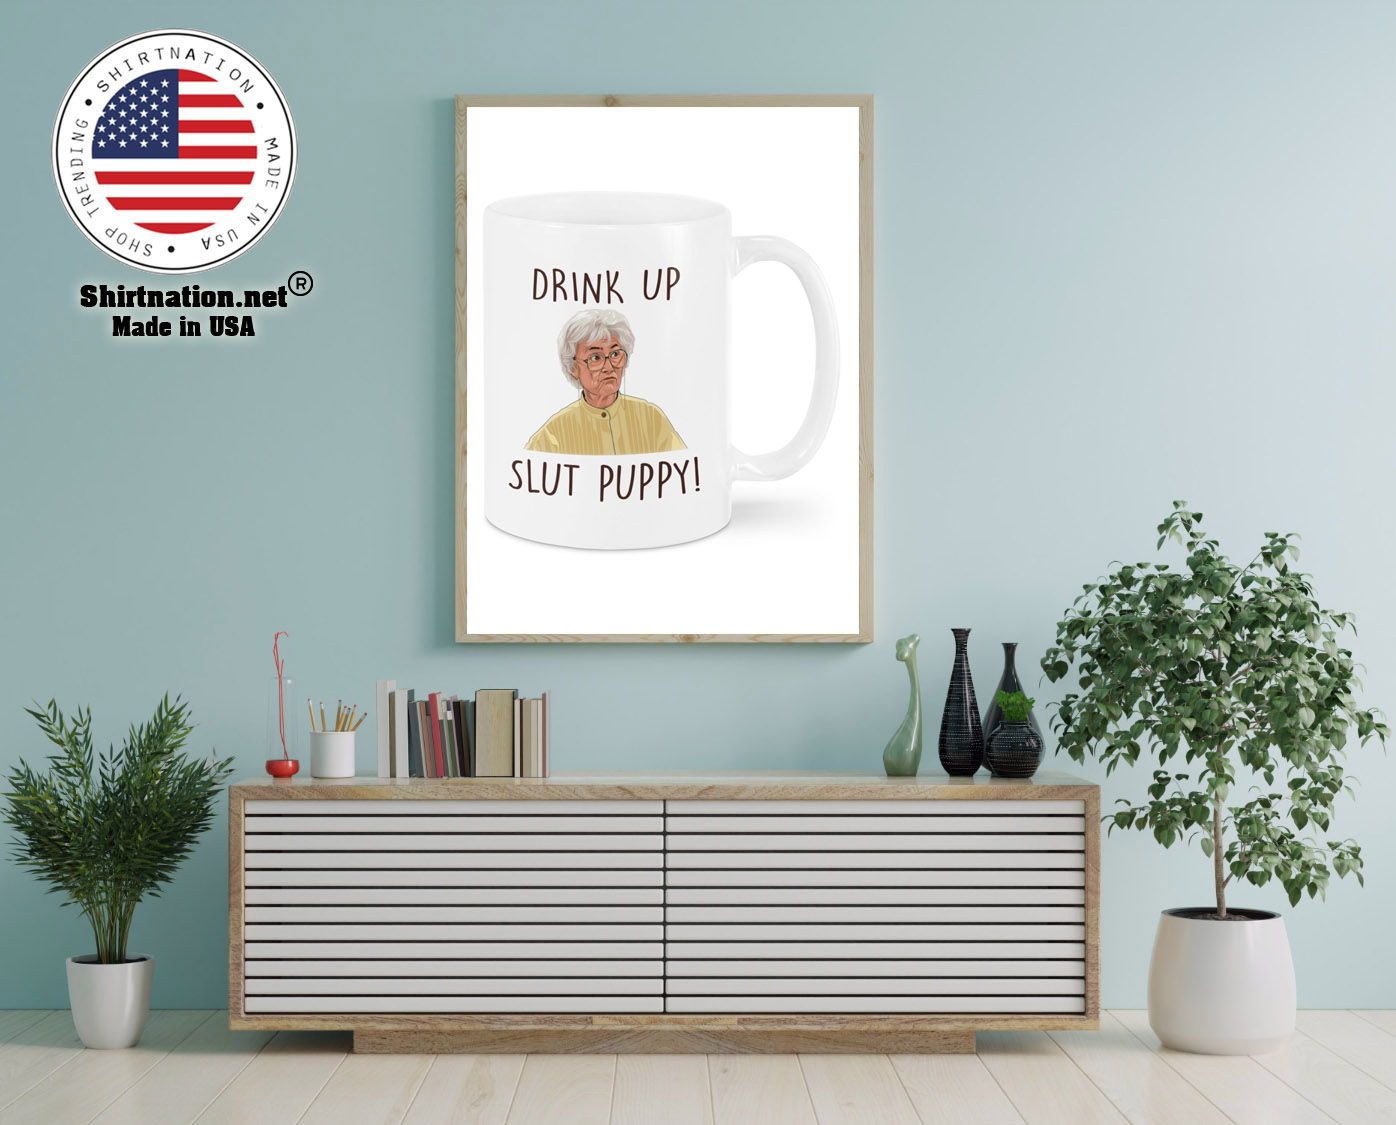 Golden girls Drink up slut puppy mug 12